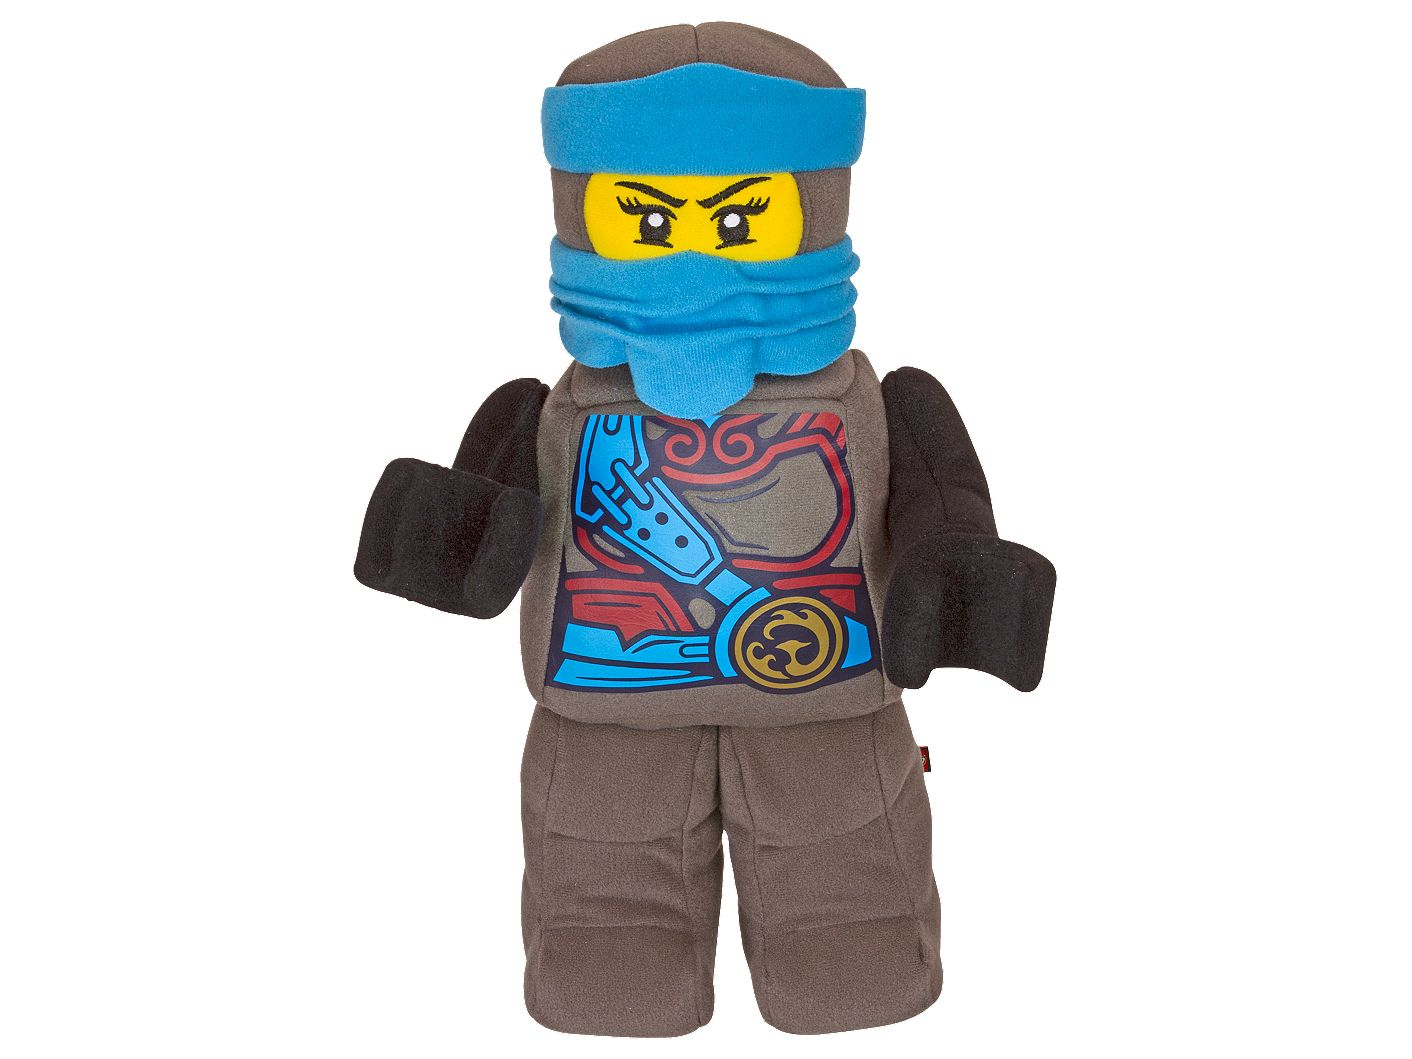 LEGO® NINJAGO® Nya Minifigure Plush